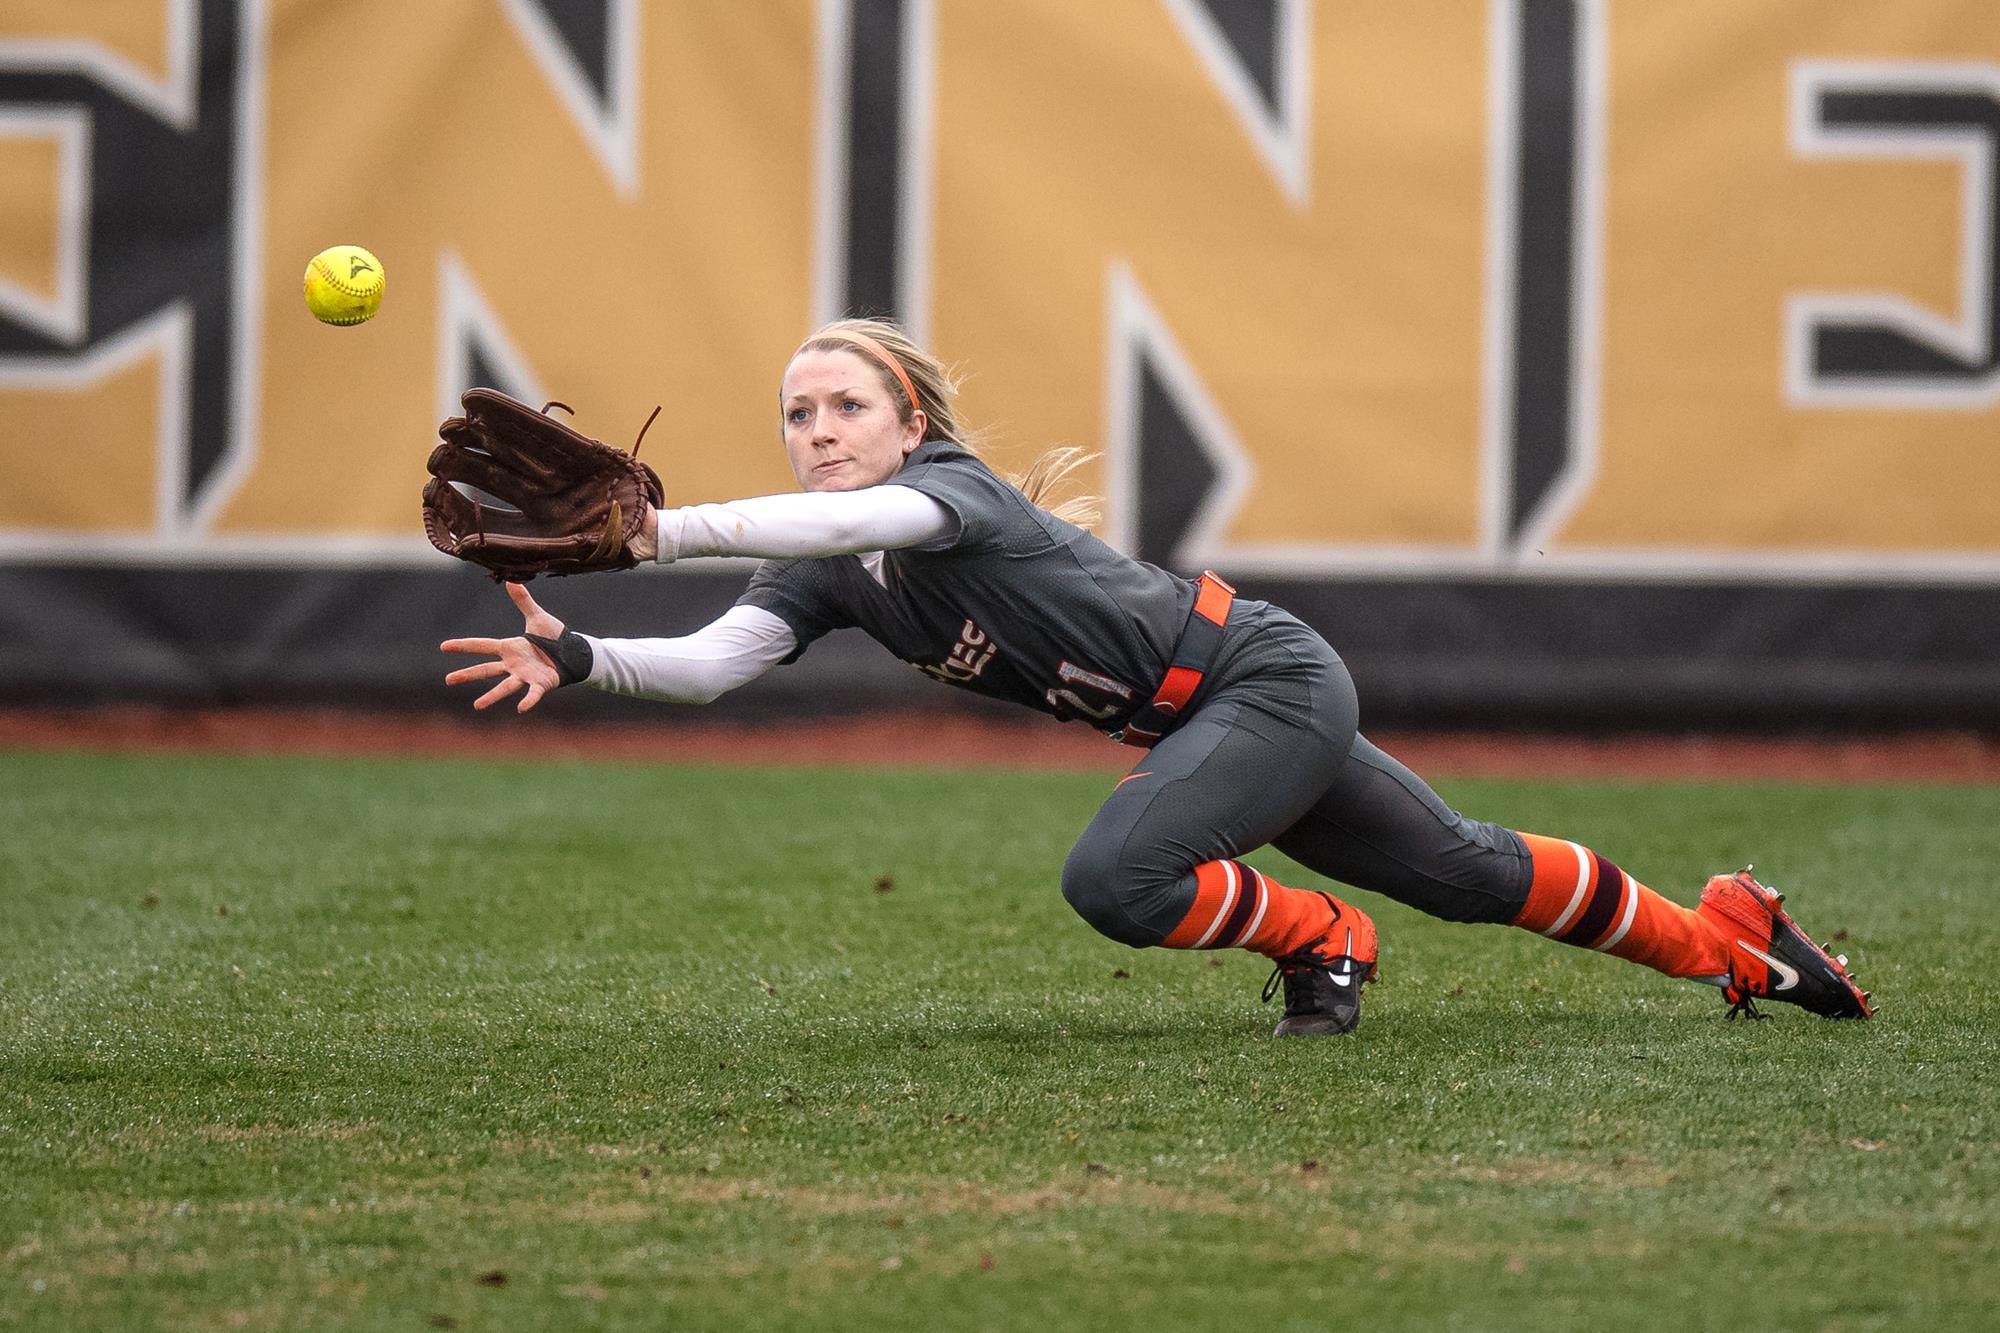 Kelsey Brown Virginia Tech Softball